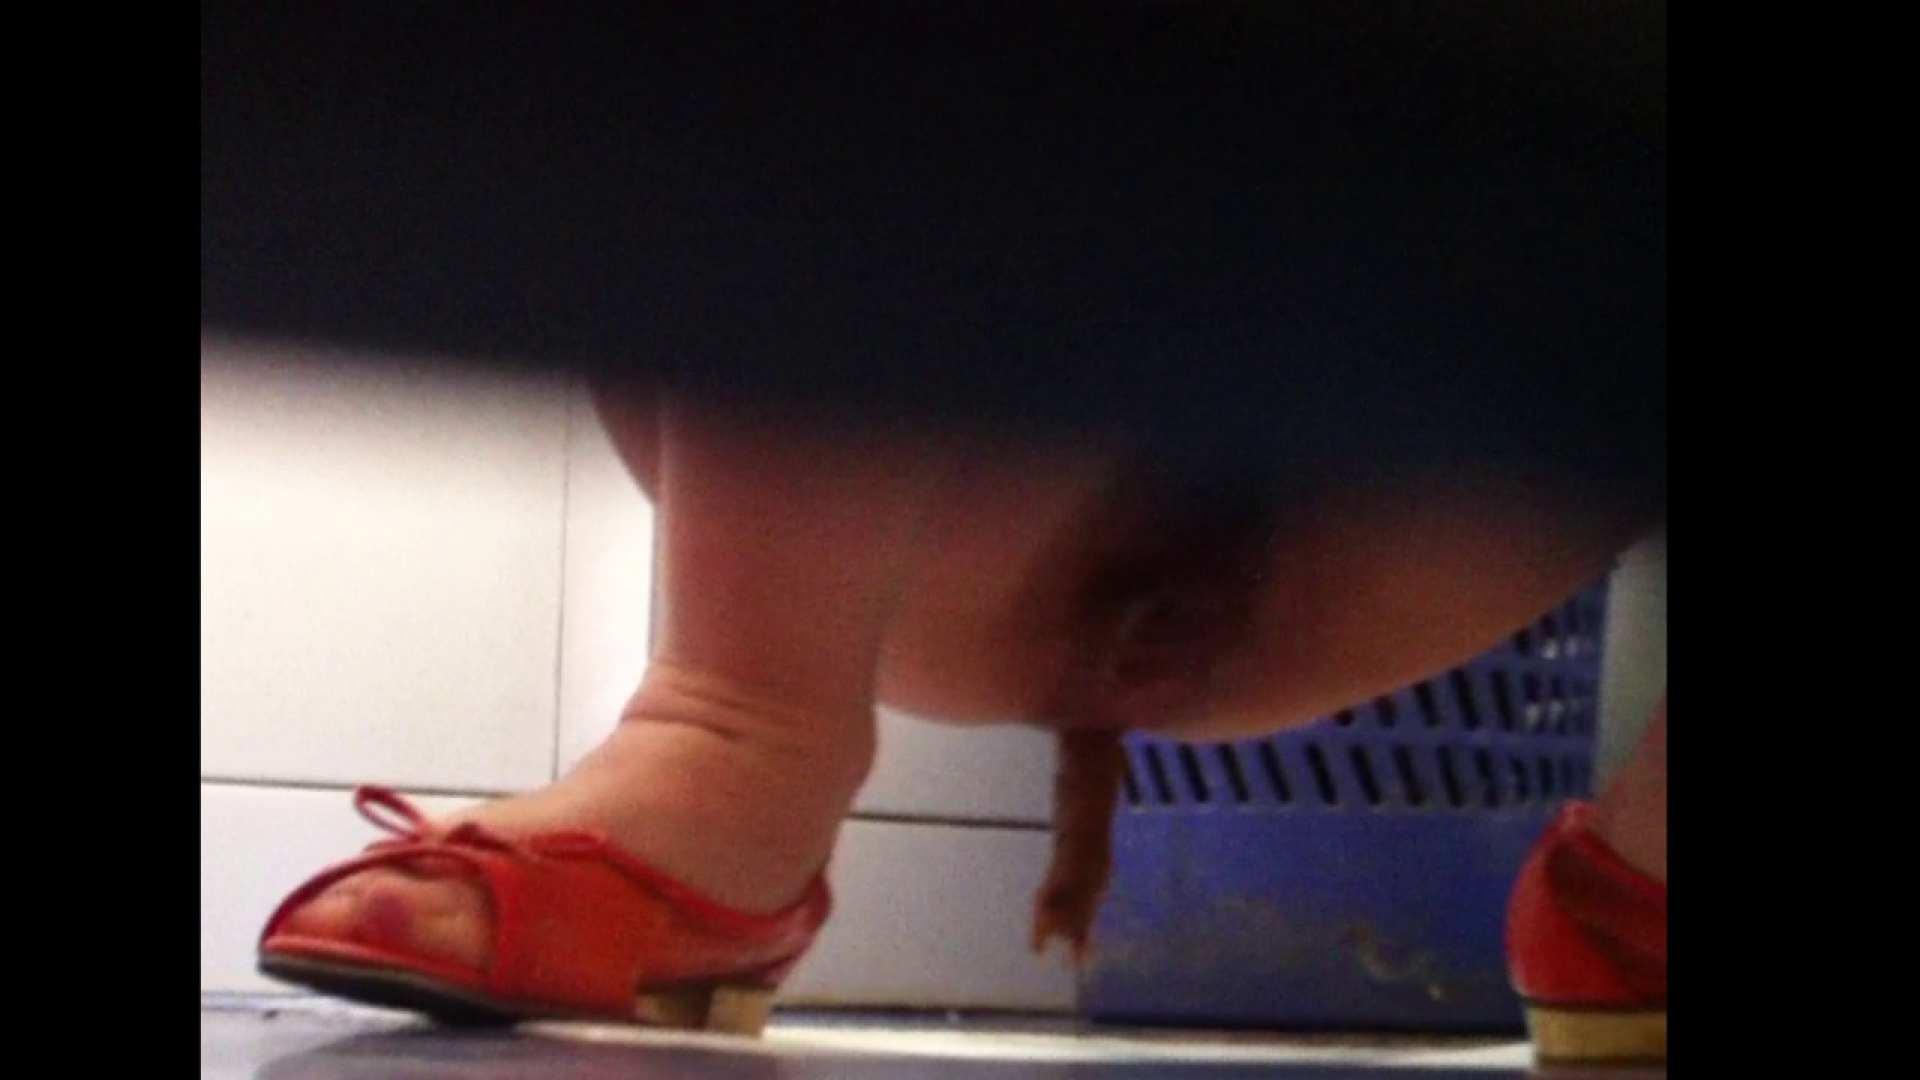 Vol.02 大な白衣の天使さん.靴、派手すぎません? 潜入 濡れ場動画紹介 103枚 3